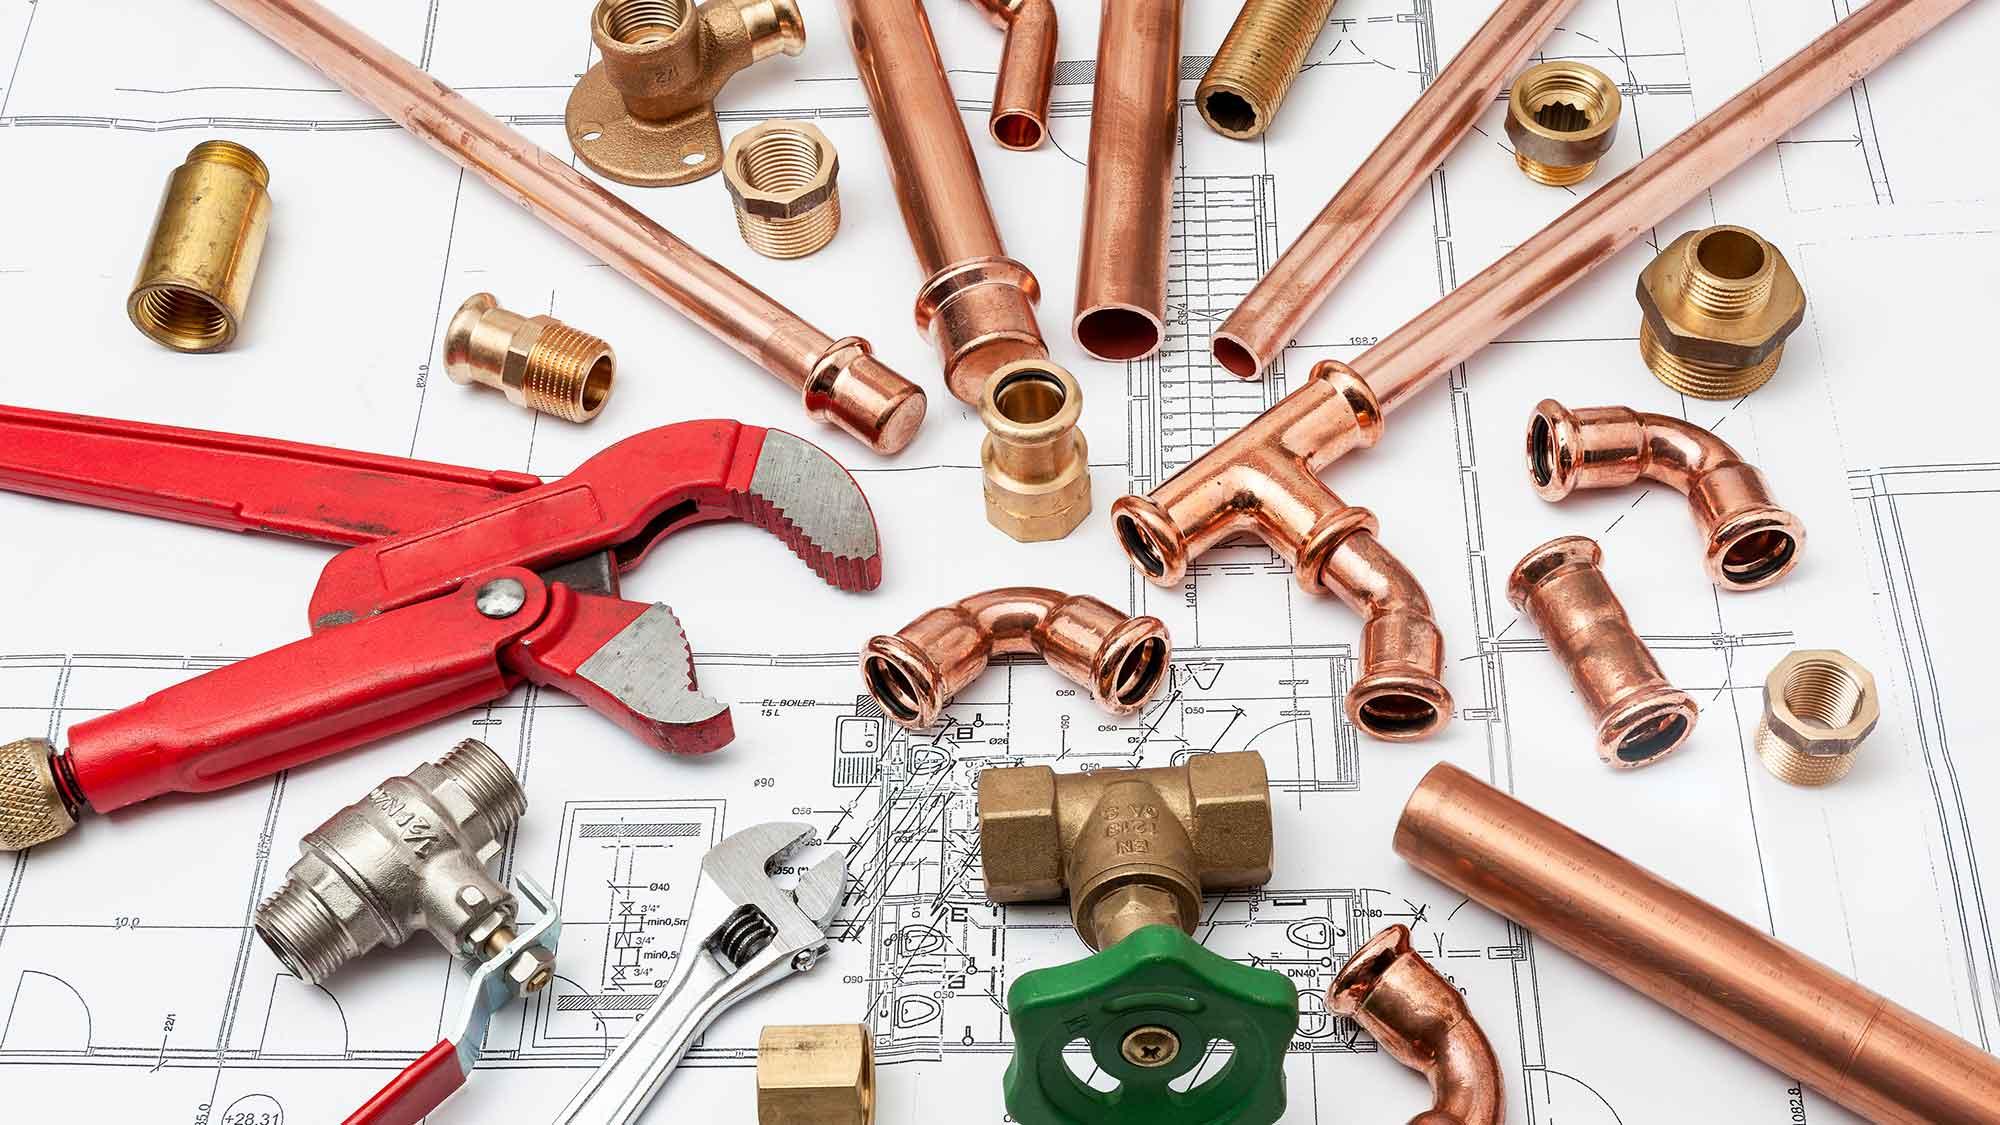 commercial boiler repair essex maintenance leigh on sea tools